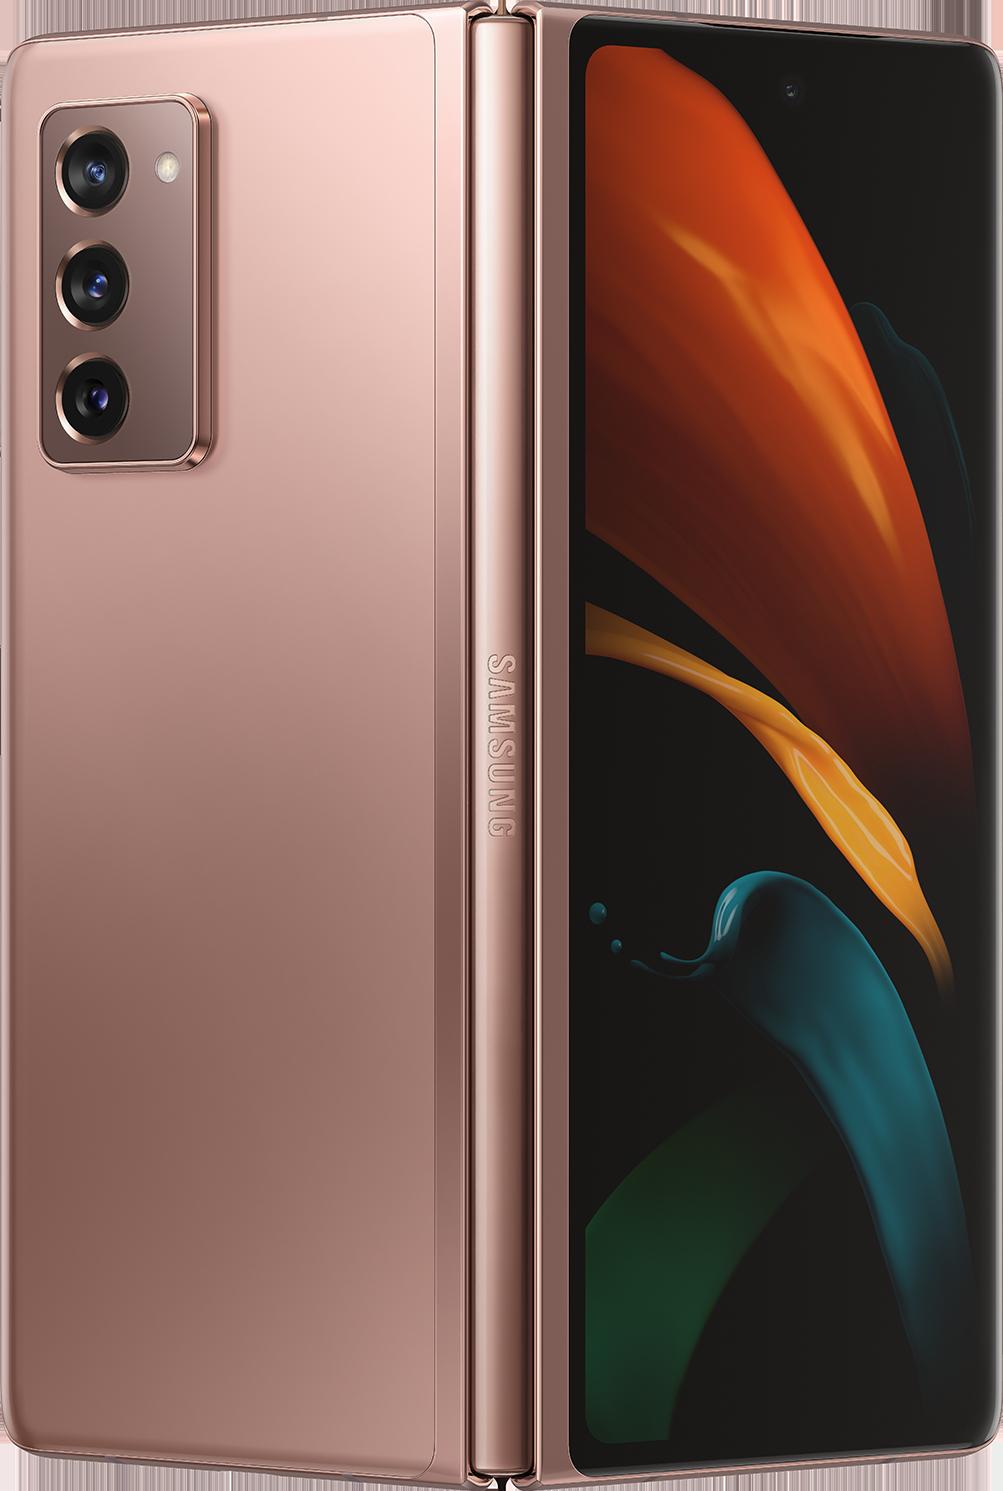 Samsung Galaxy Z Fold2 5G (Unlocked) - Mystic Bronze